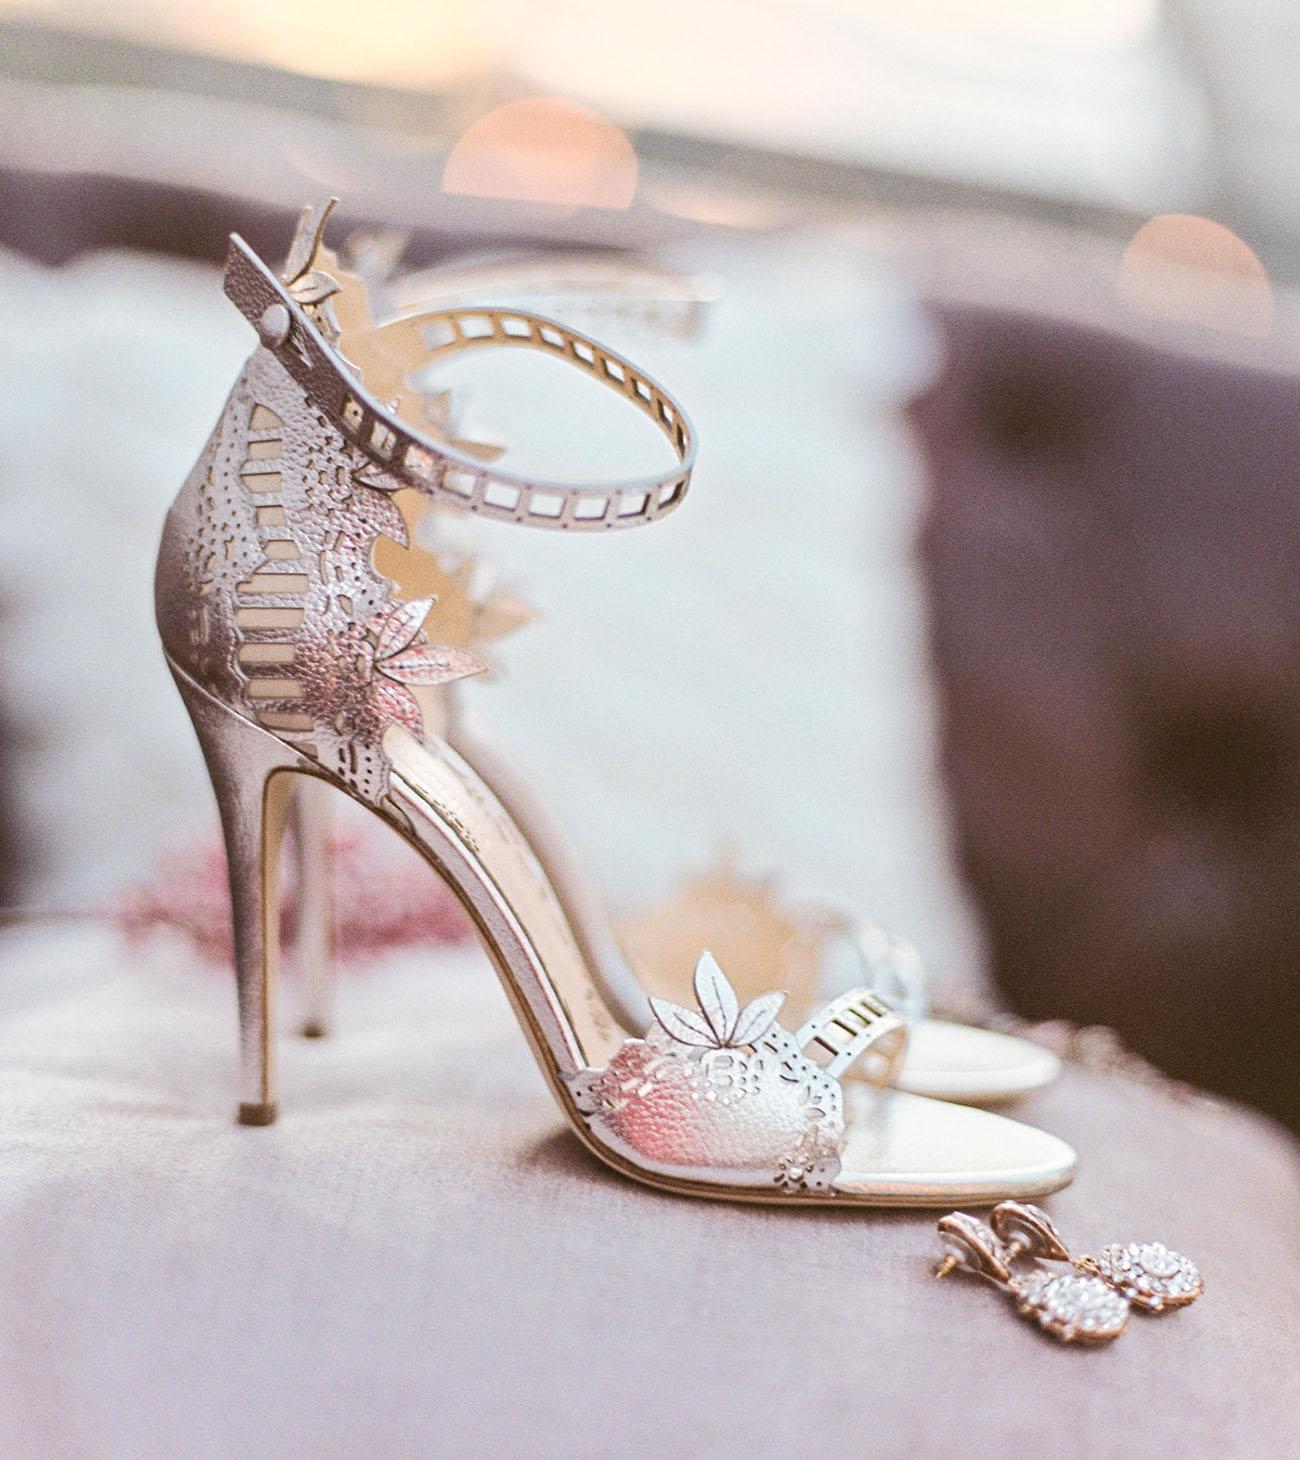 marchesa shoes modern city inspiration